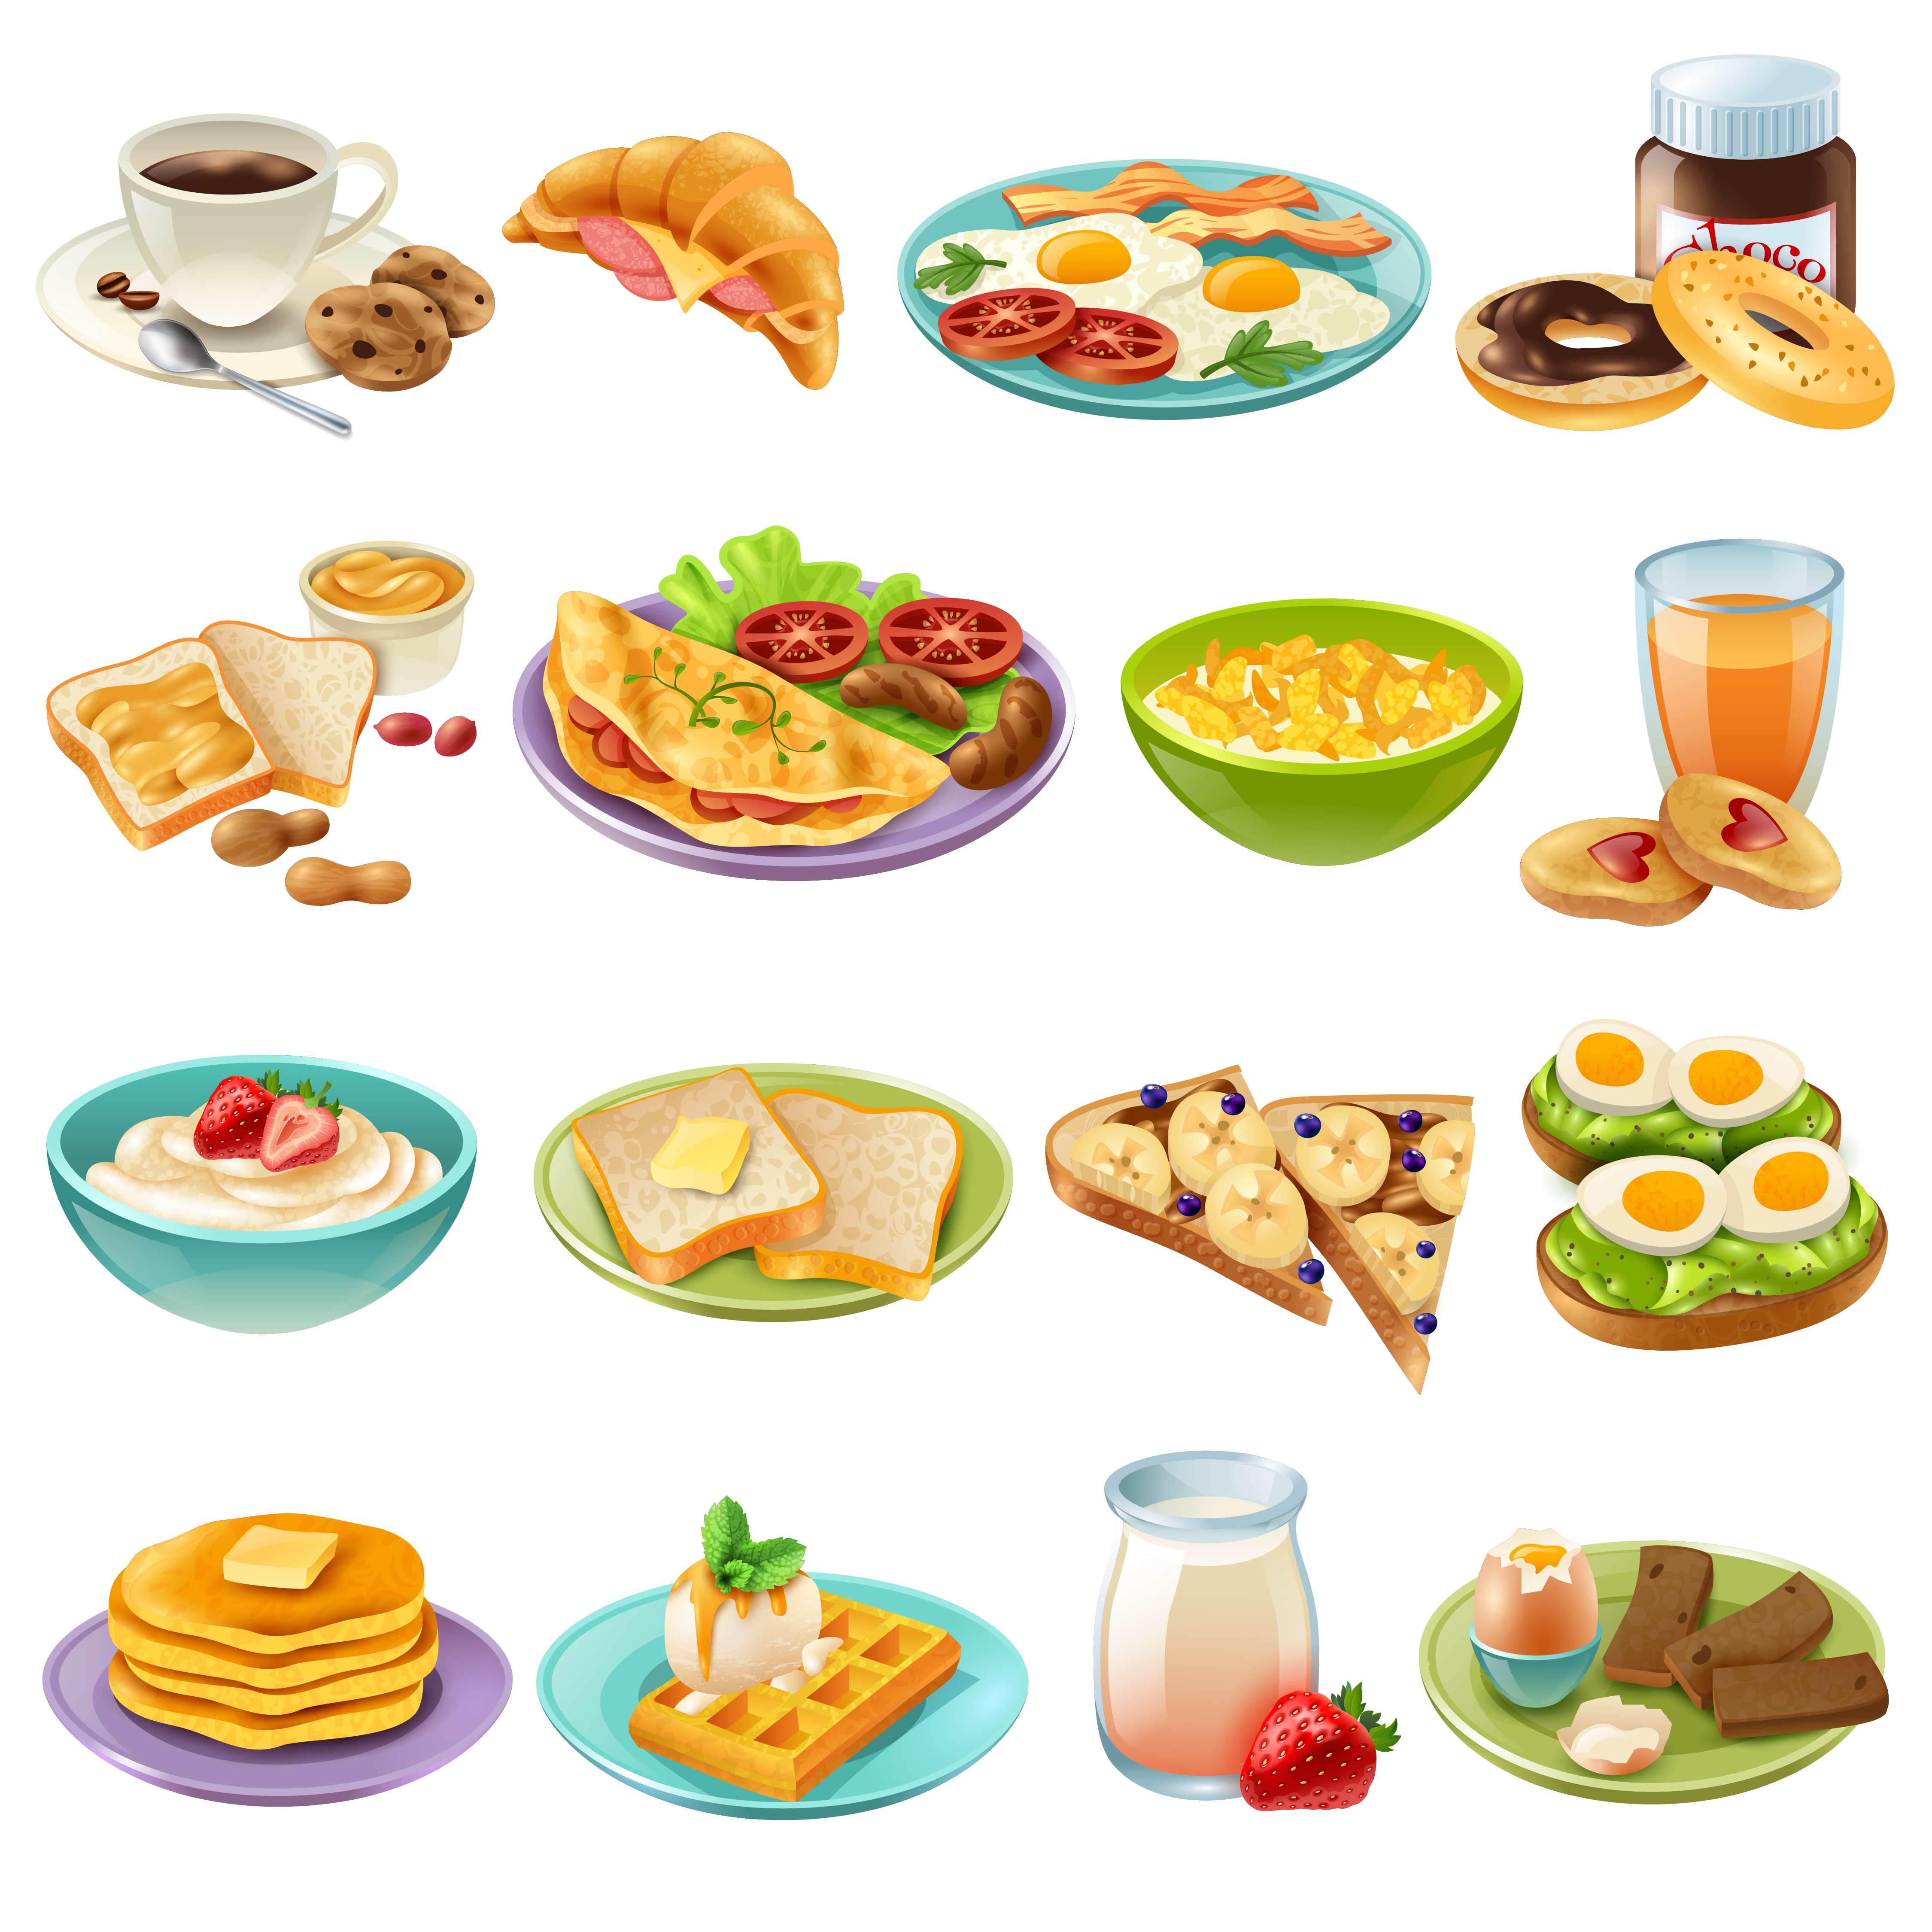 Breakfast Brunch Menu Food Icons Set - Download Free ...